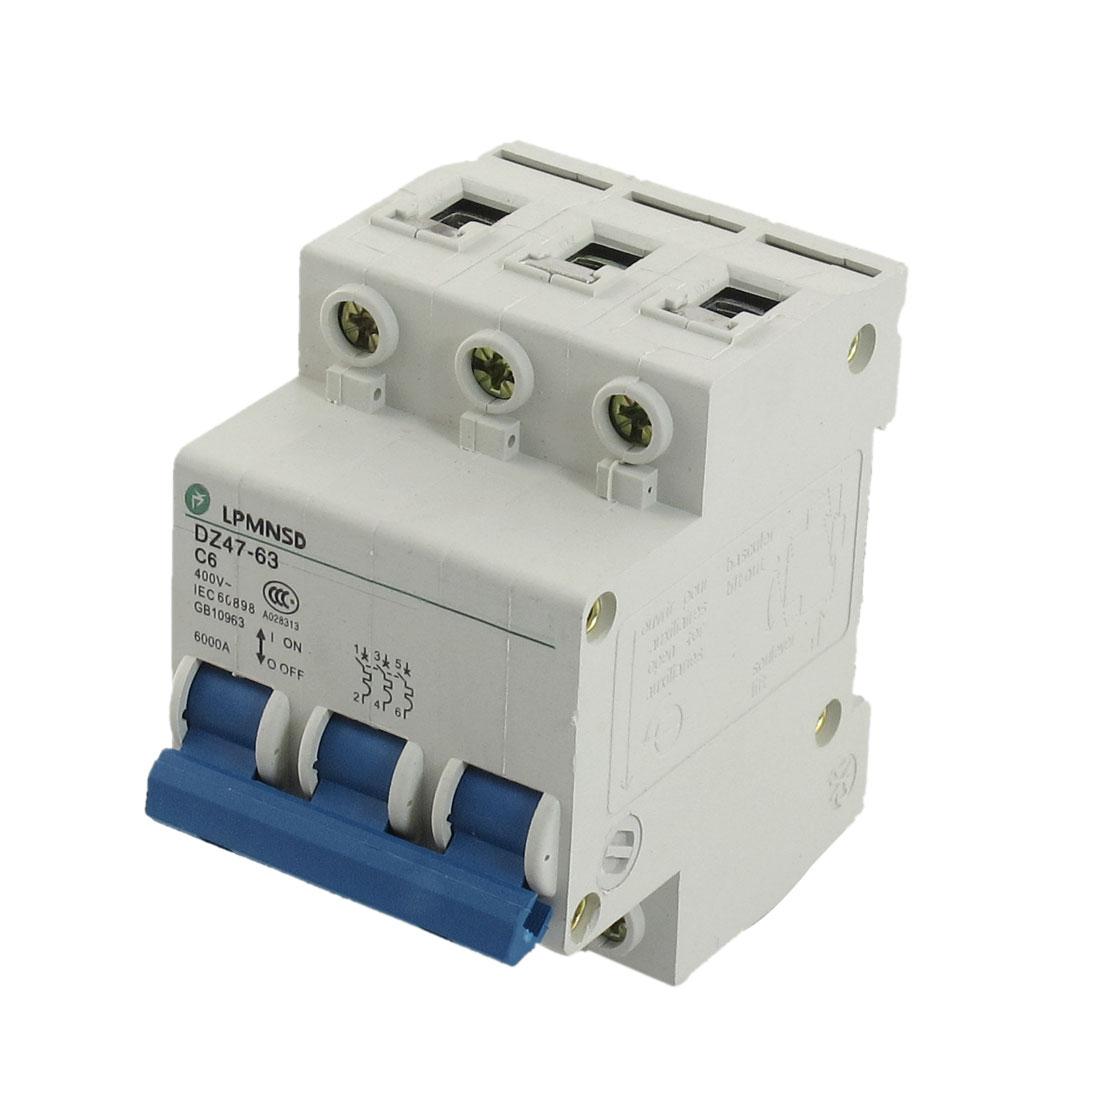 DZ47-63 C6 6A 400VAC 6000A Breaking Capacity 3 Poles Circuit Breaker